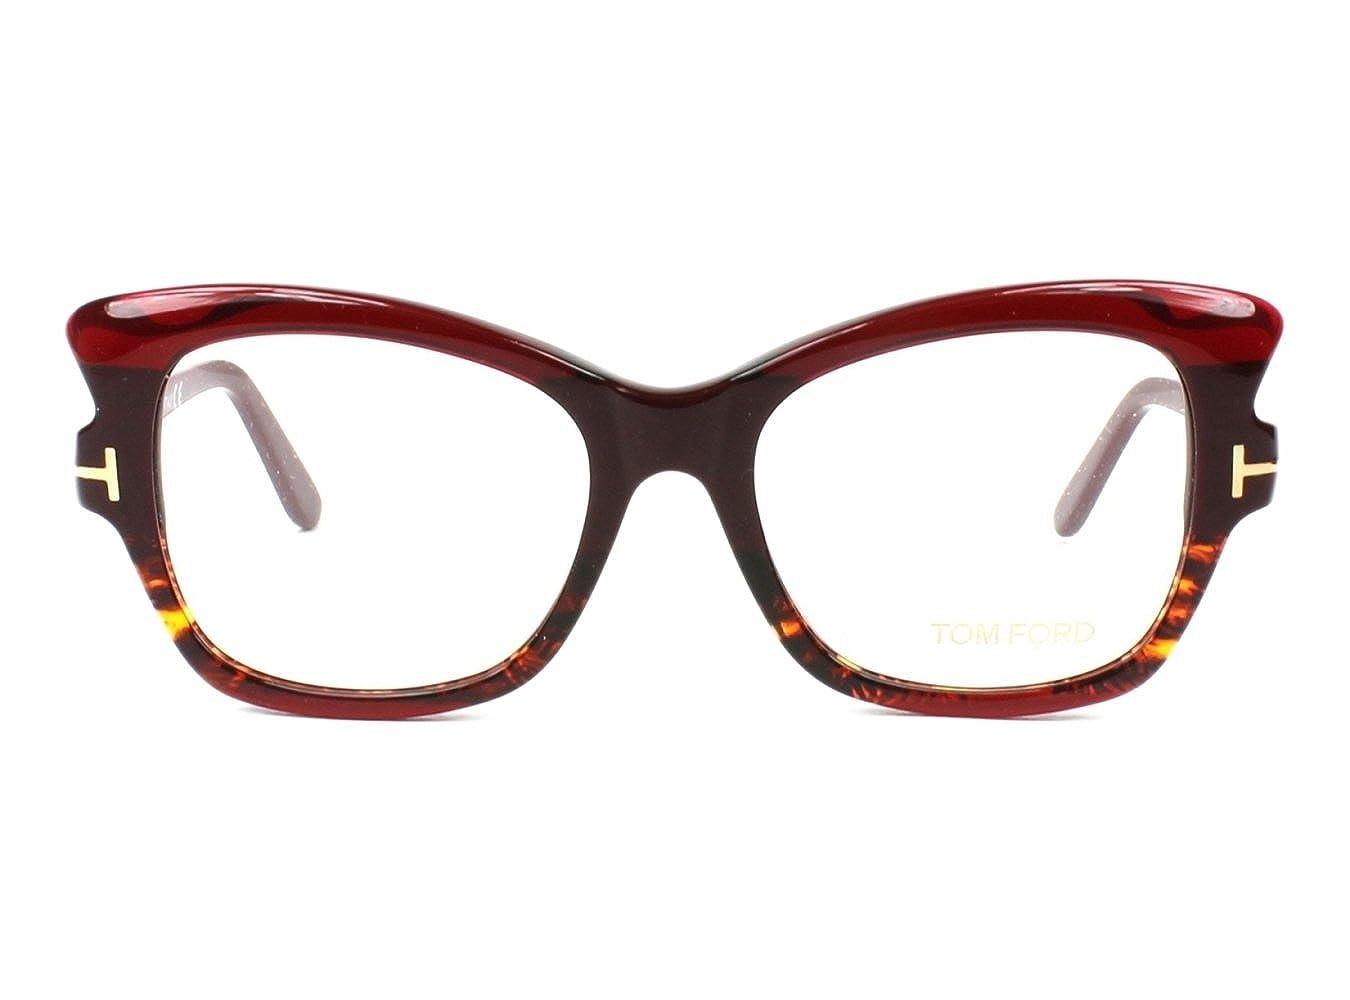 34373dffdf02 Amazon.com: Tom Ford FT4268 020 RX Eyeglasses,Size:51: Clothing